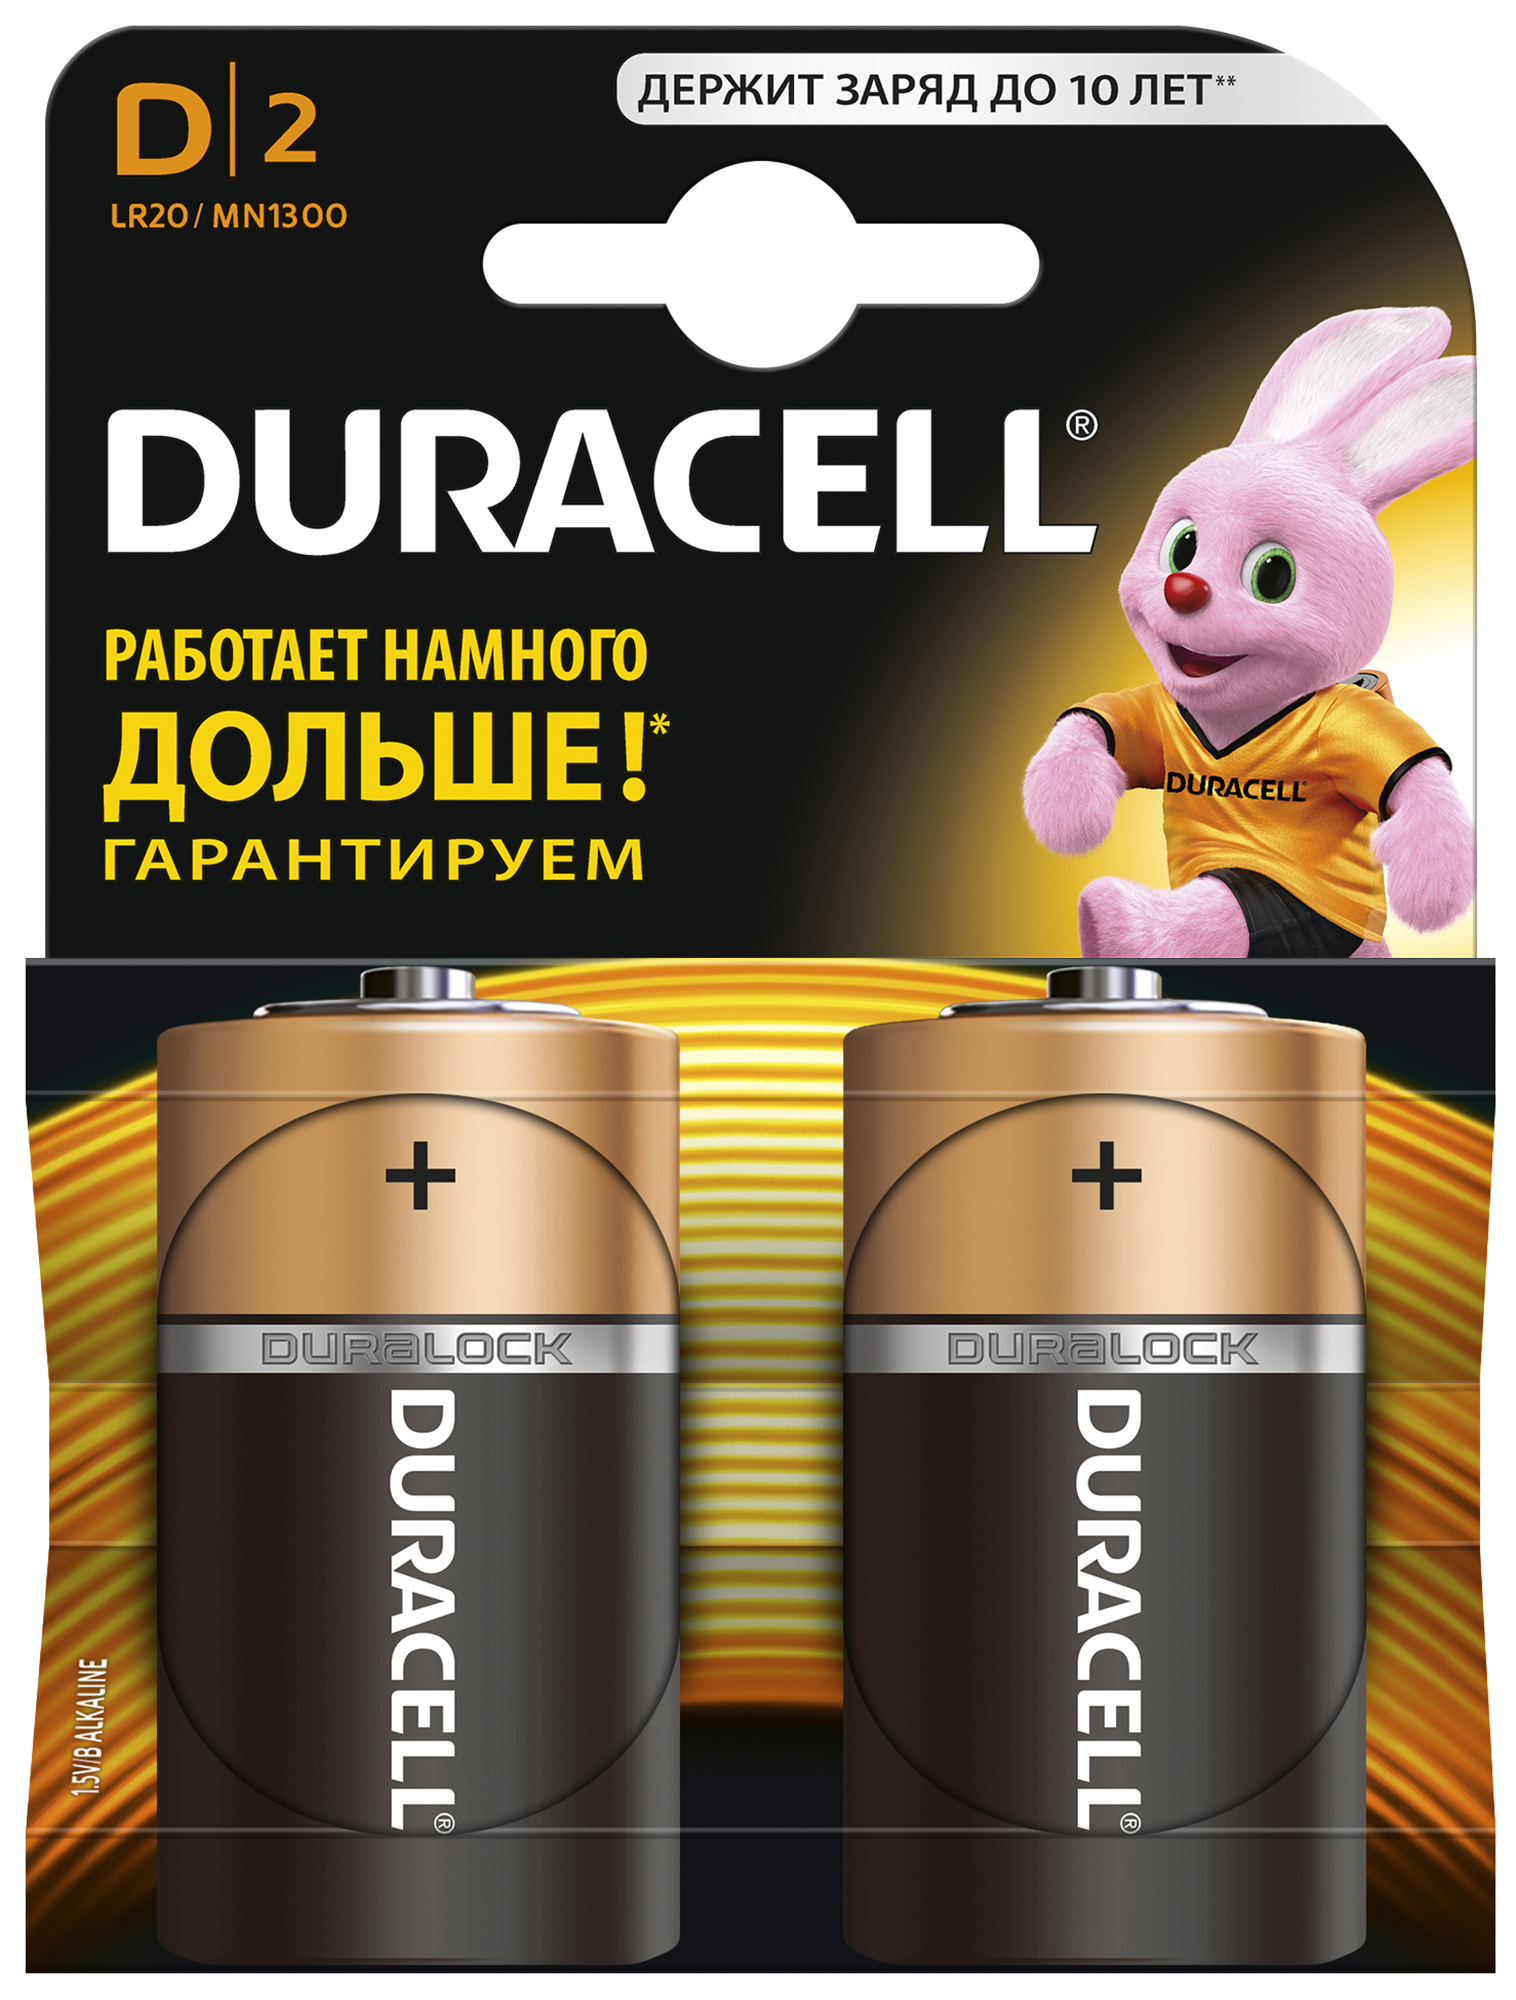 Duracell Батарейки щелочные Basic D/LR20, 2 шт.